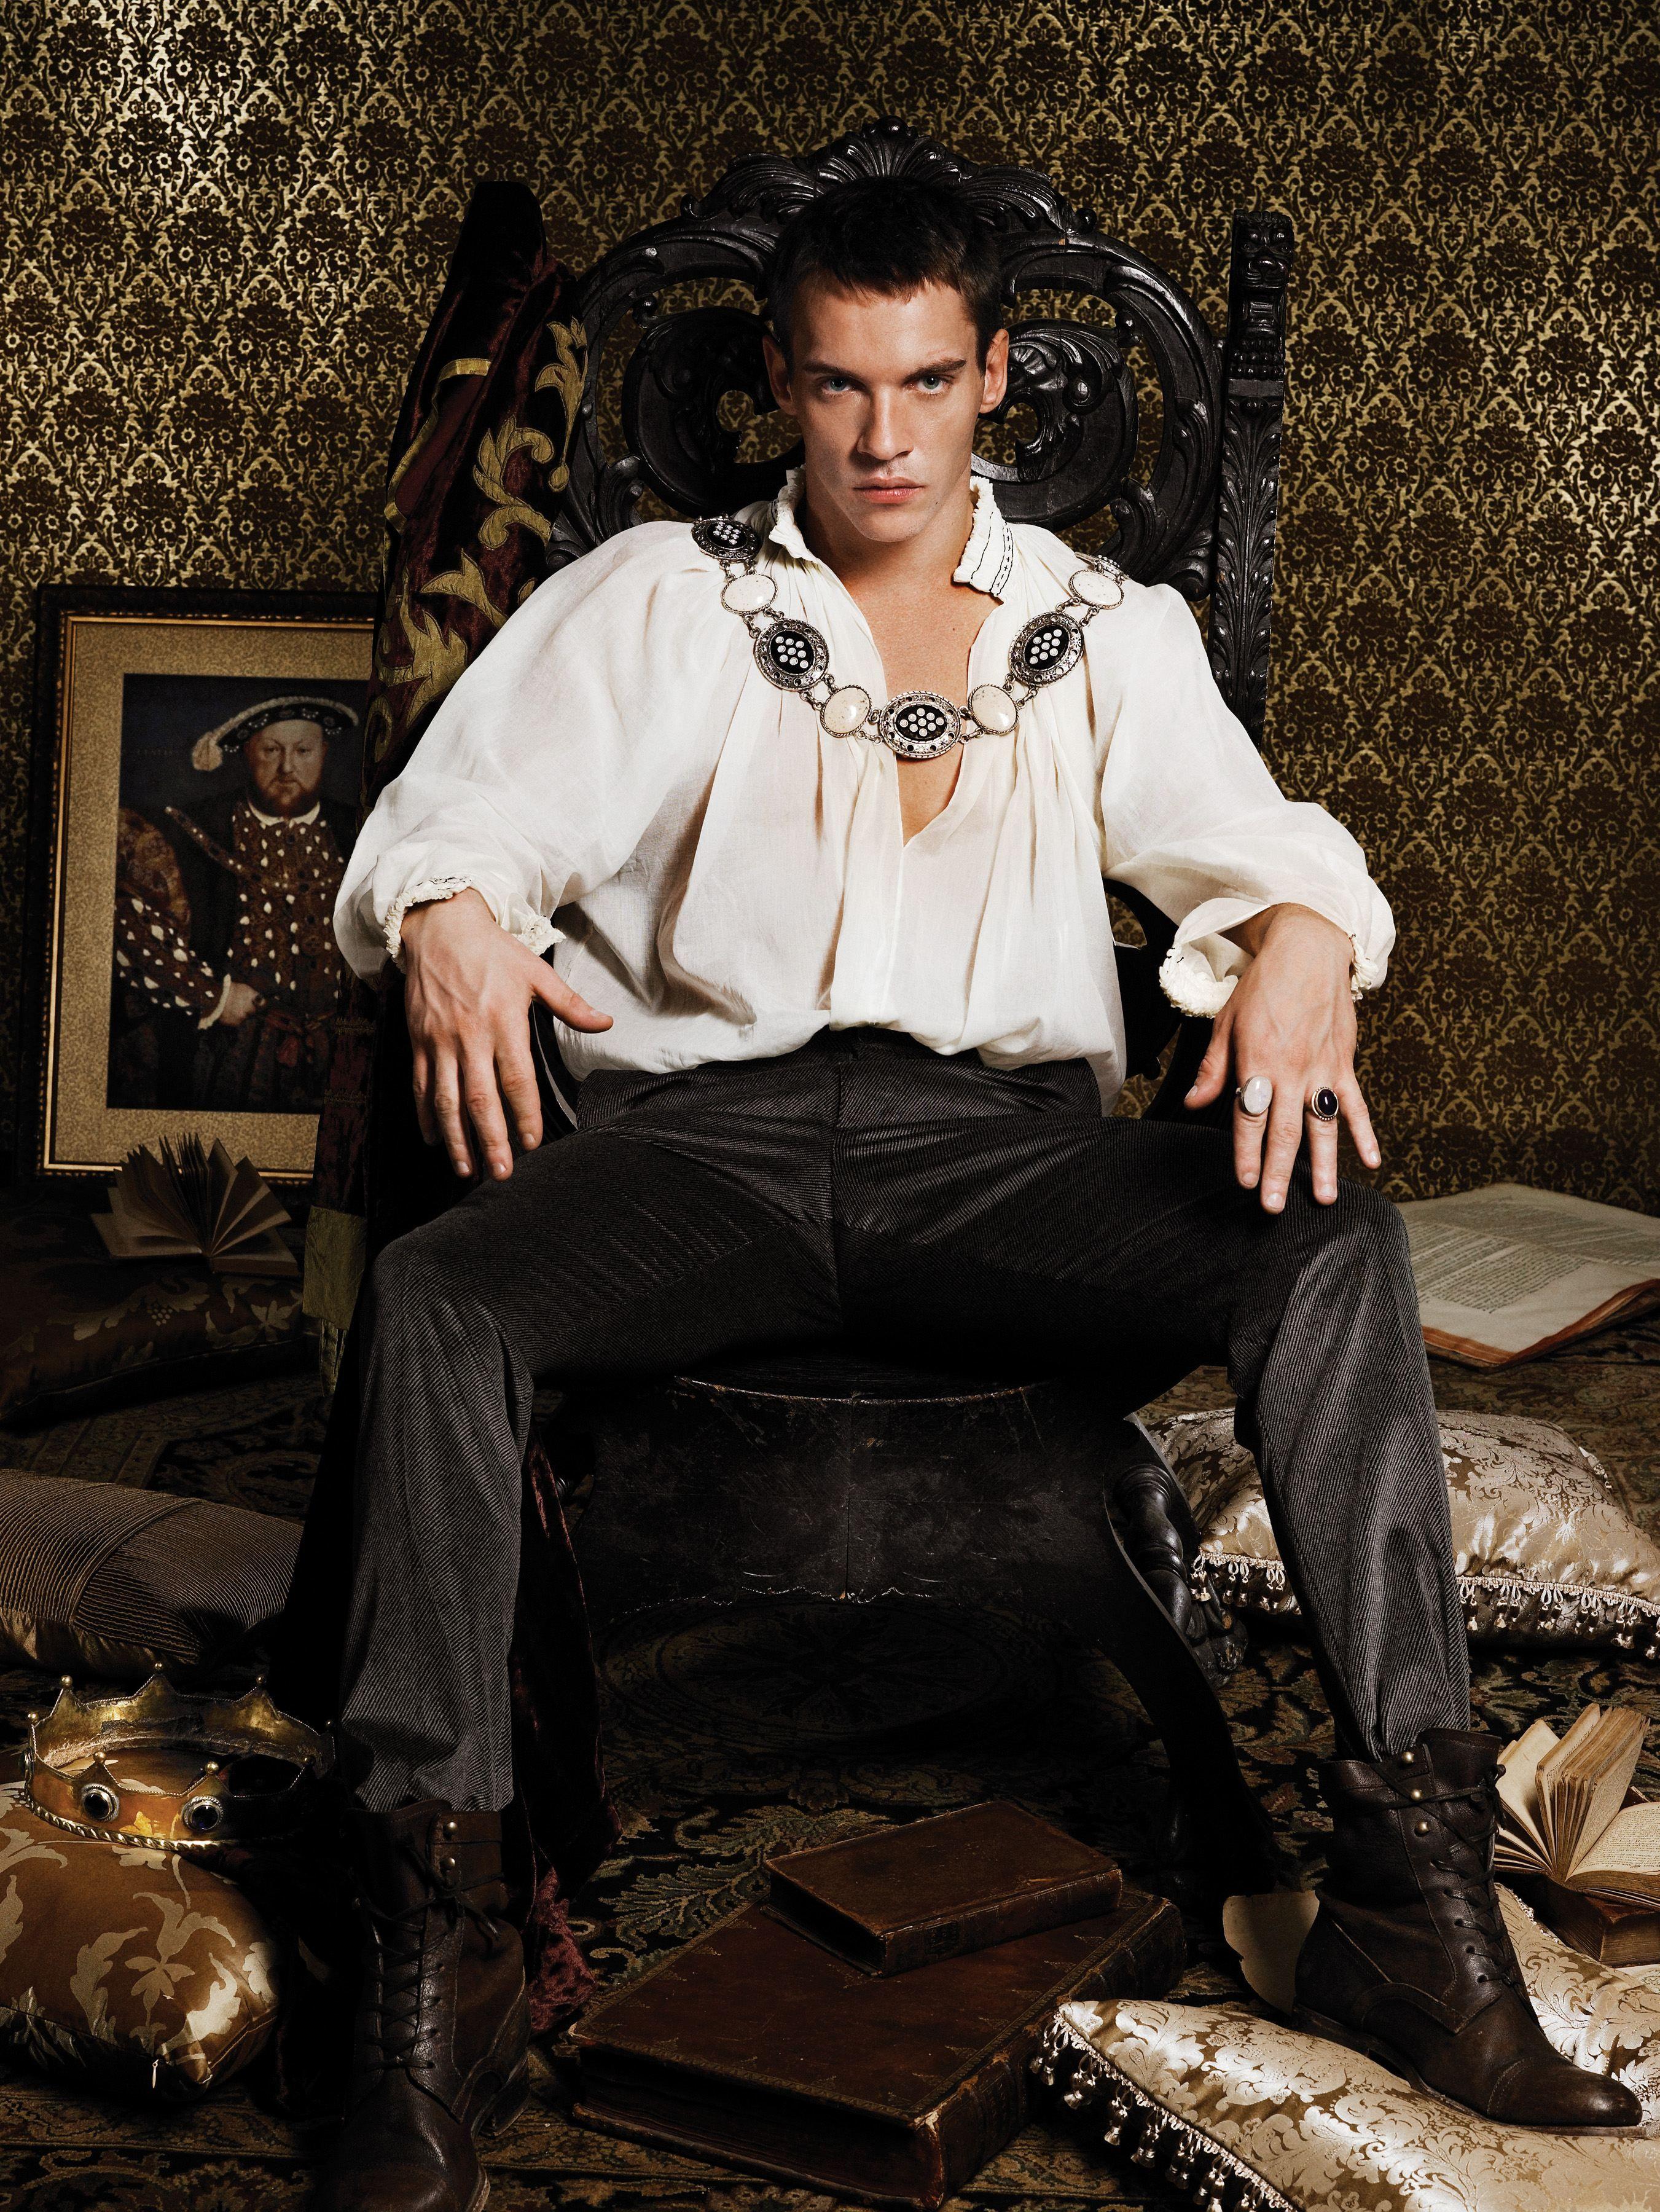 Jonathan Rhys Meyers The Tudors Season 4 The Tudors - Season 1 ...